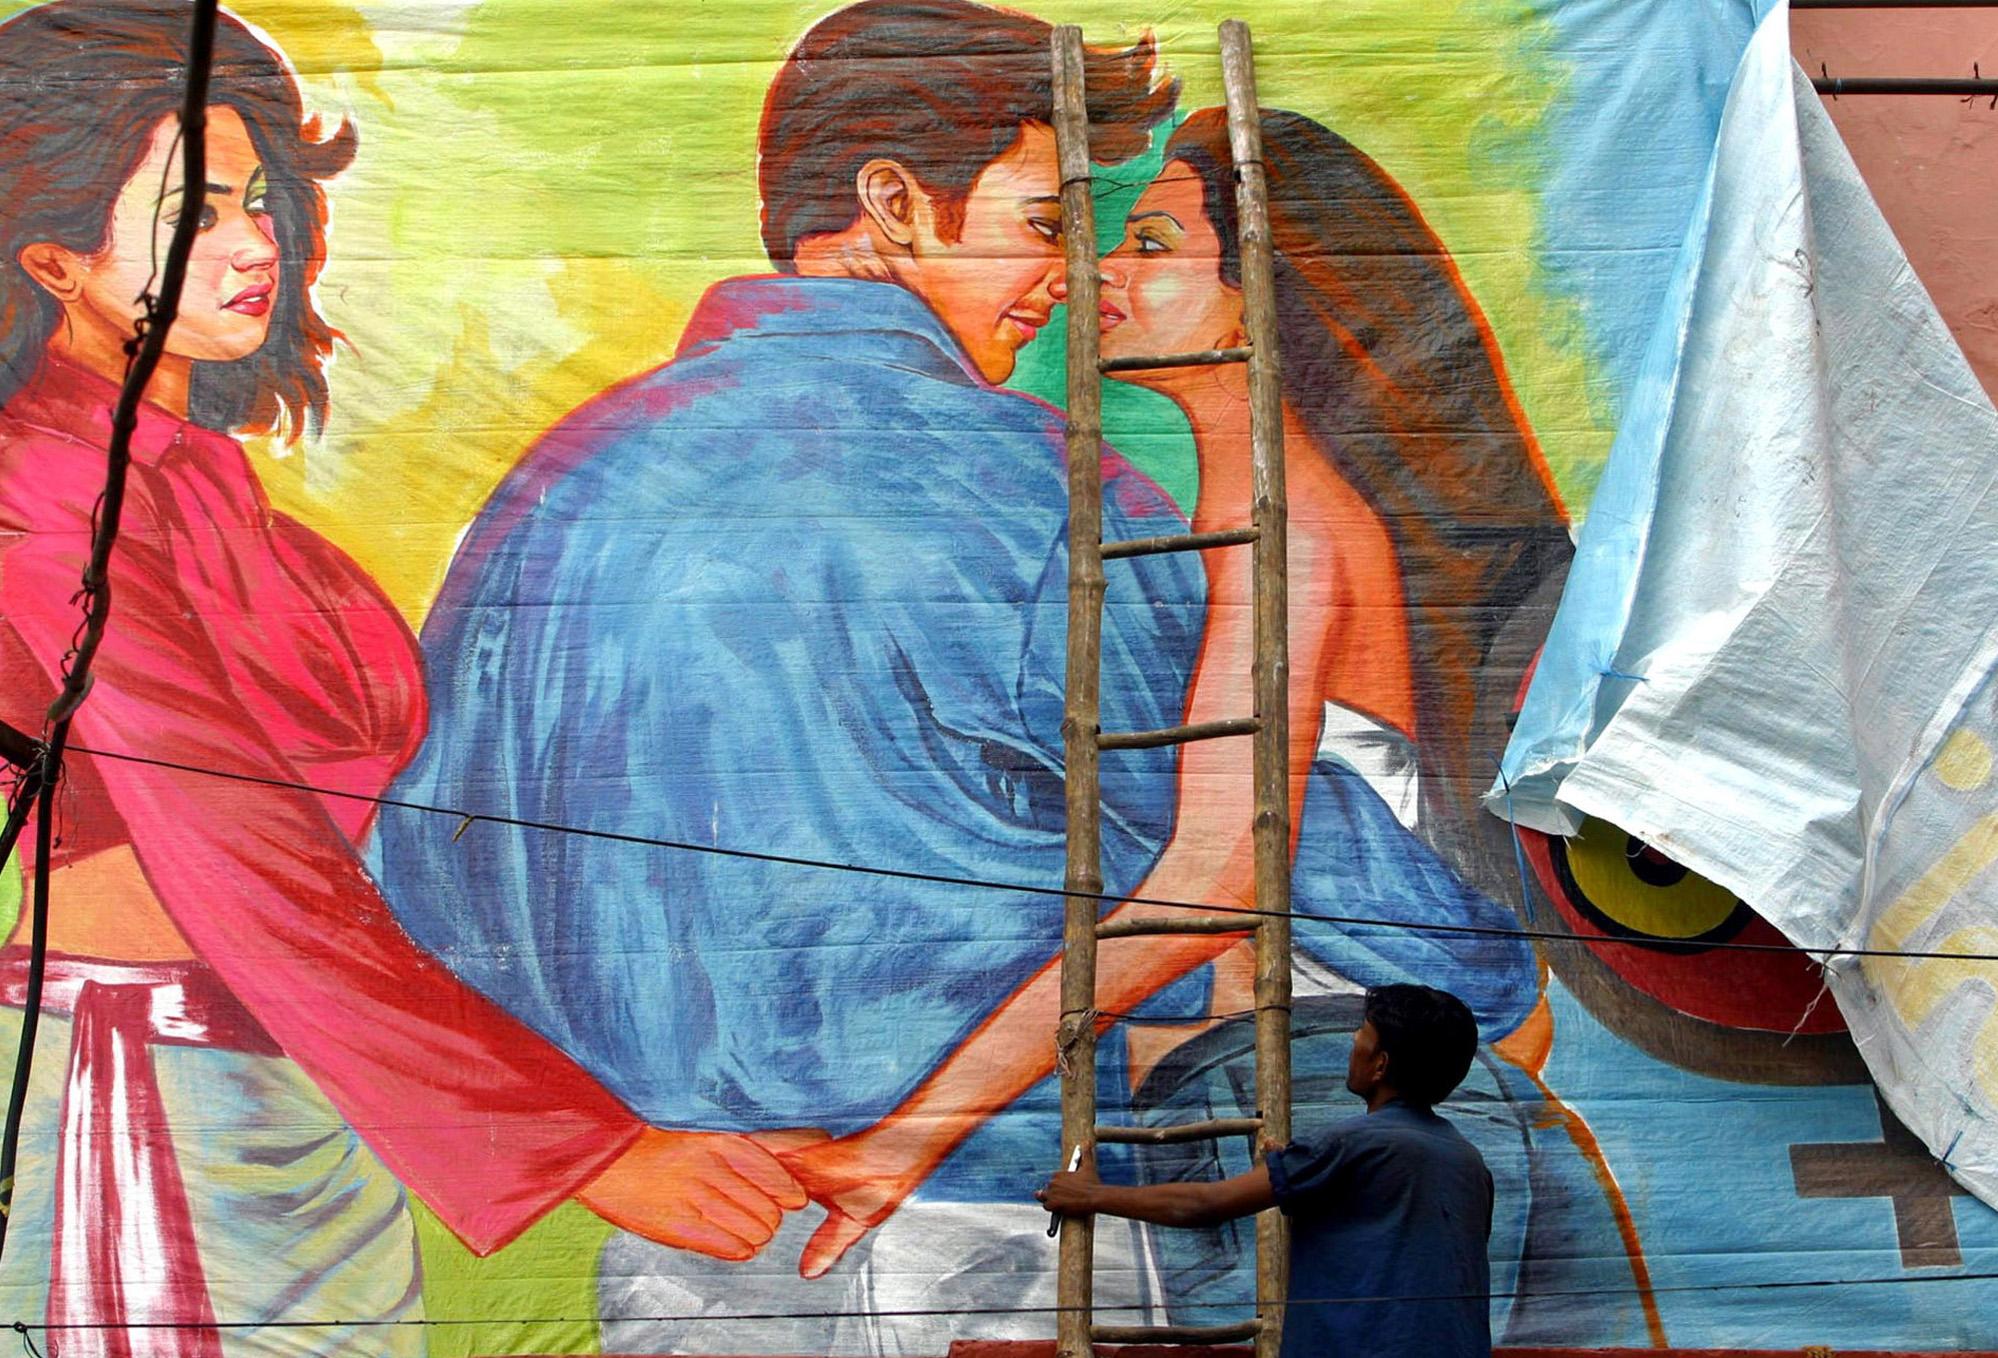 Mural of women and men holding hands